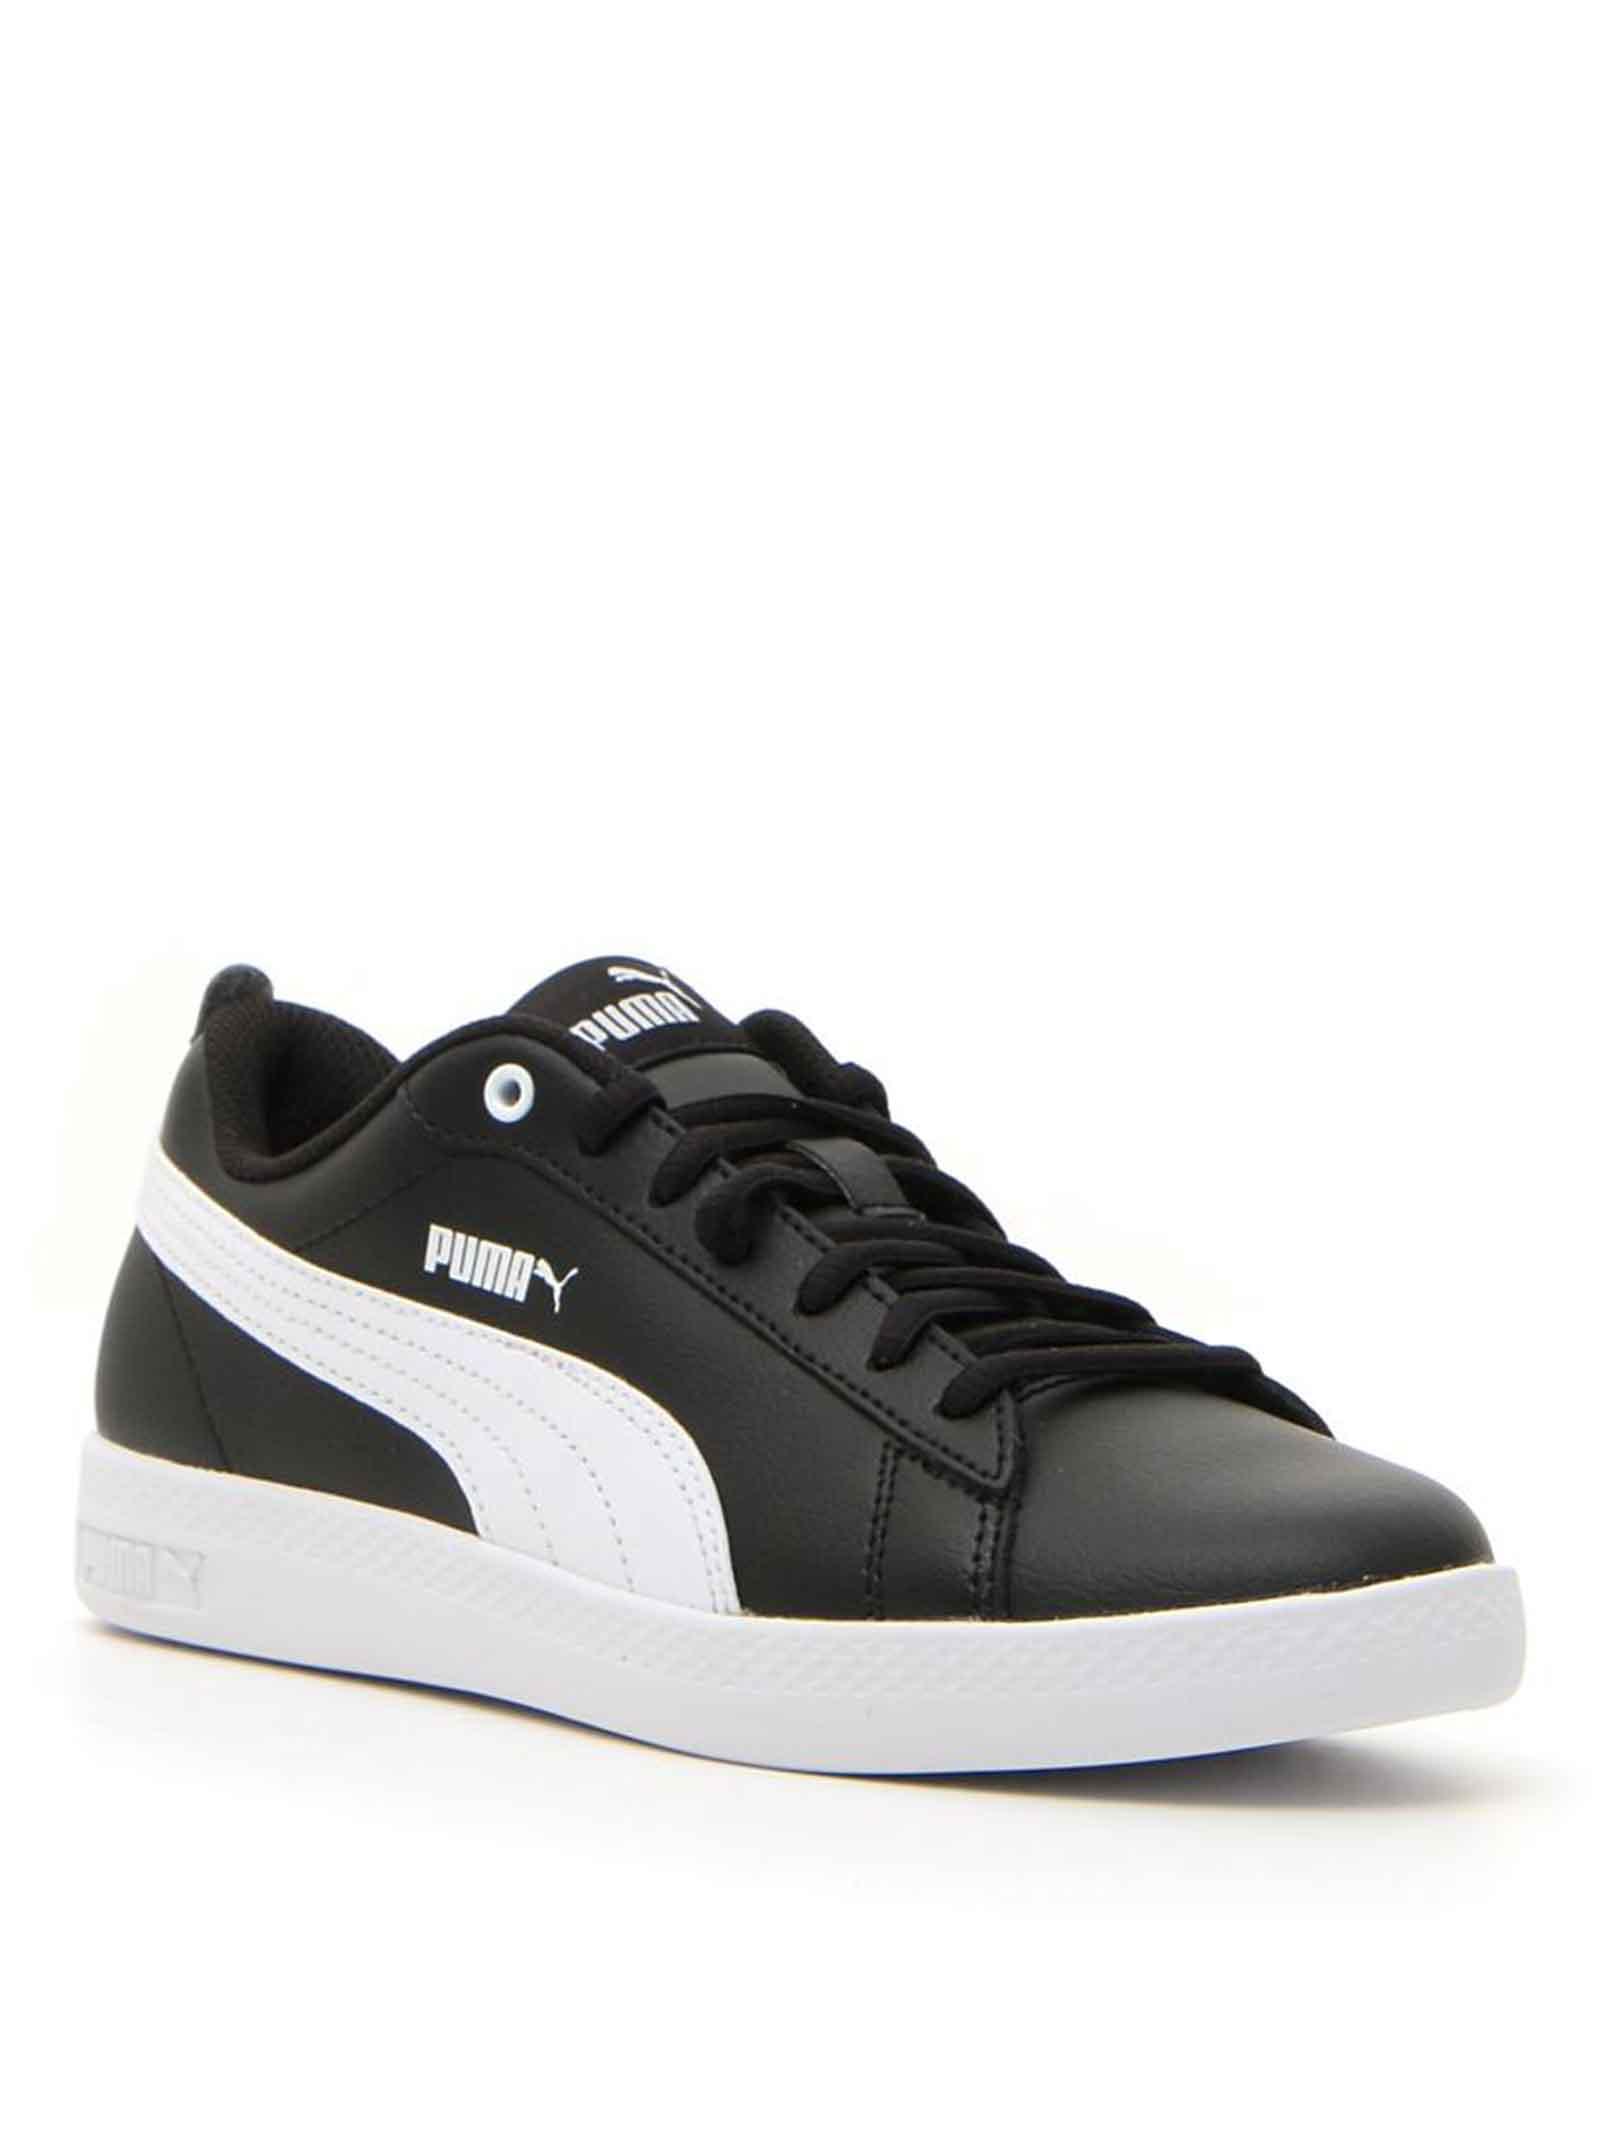 Calzature Uomo Sneakers Smash V2 in Ecopelle Nero 365215-004 Puma   Sneakers   SMASH V204